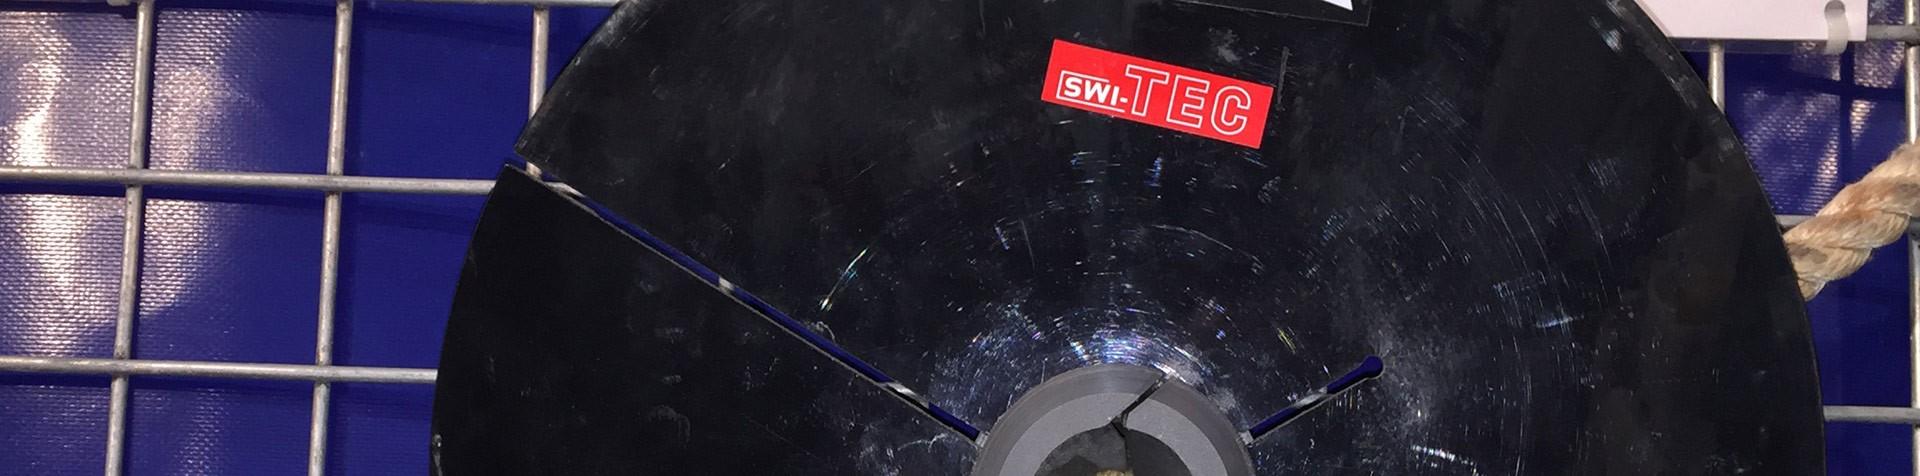 Swi-Tec